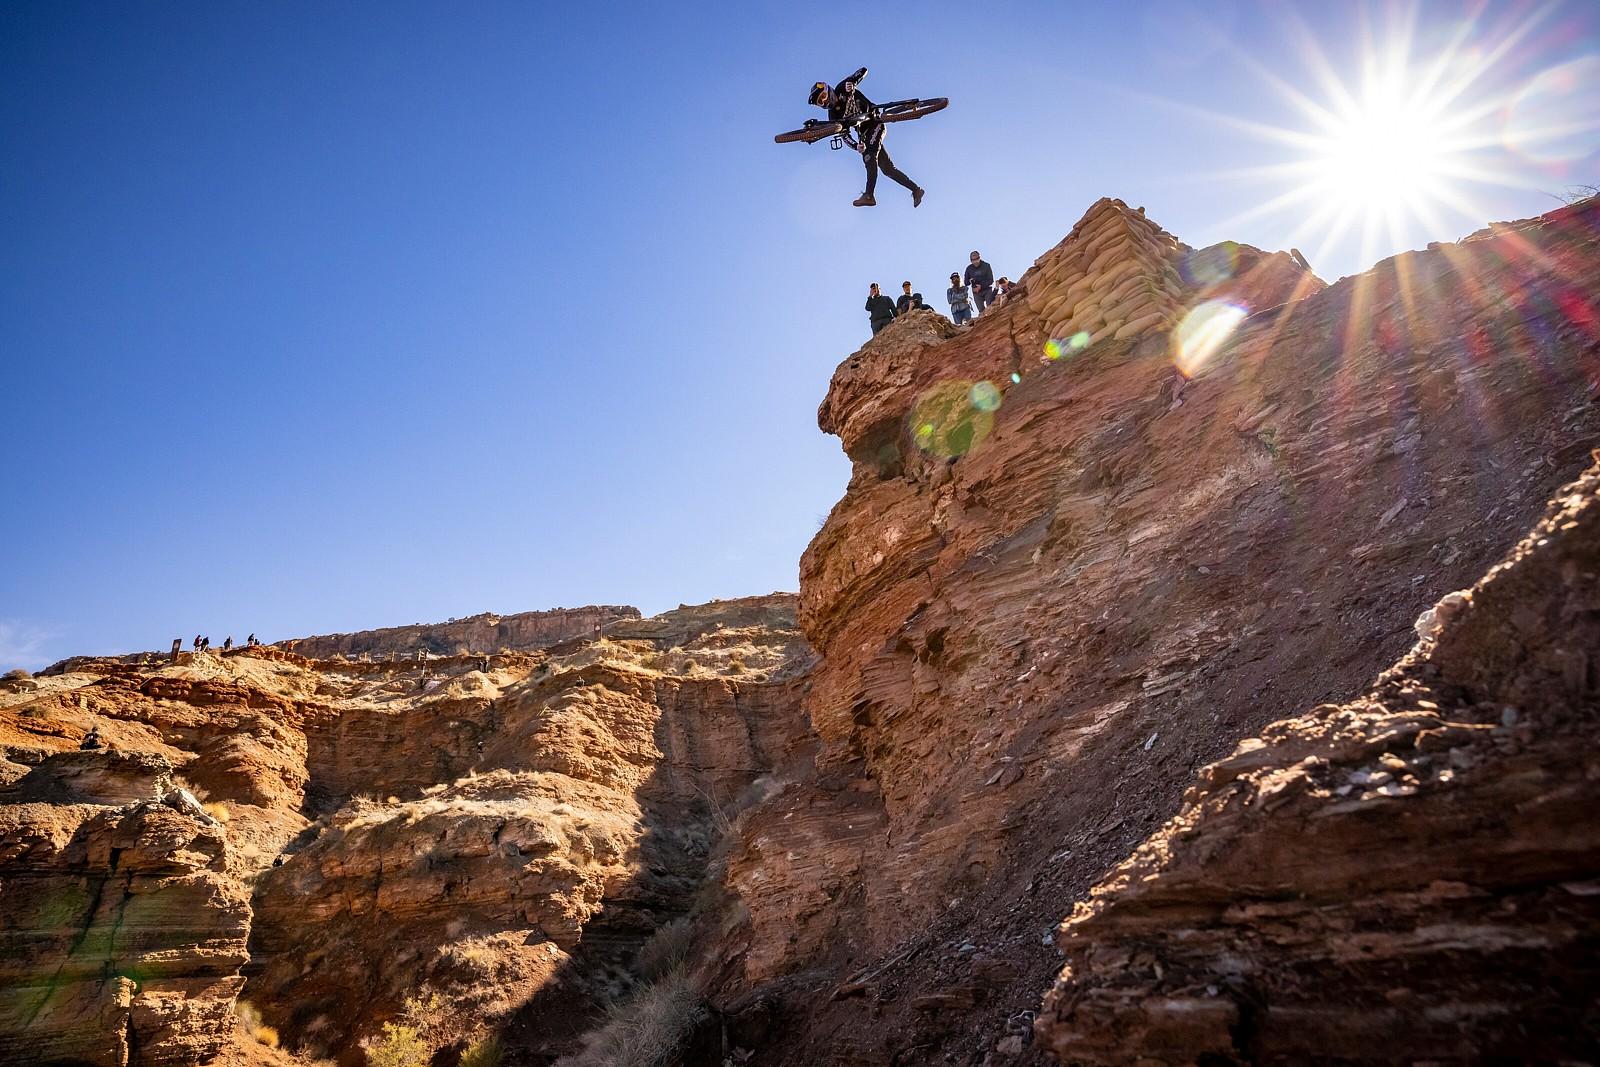 Brandon Semenuk Tailwhip Drop - 2021 Red Bull Rampage Photos - Mountain Biking Pictures - Vital MTB